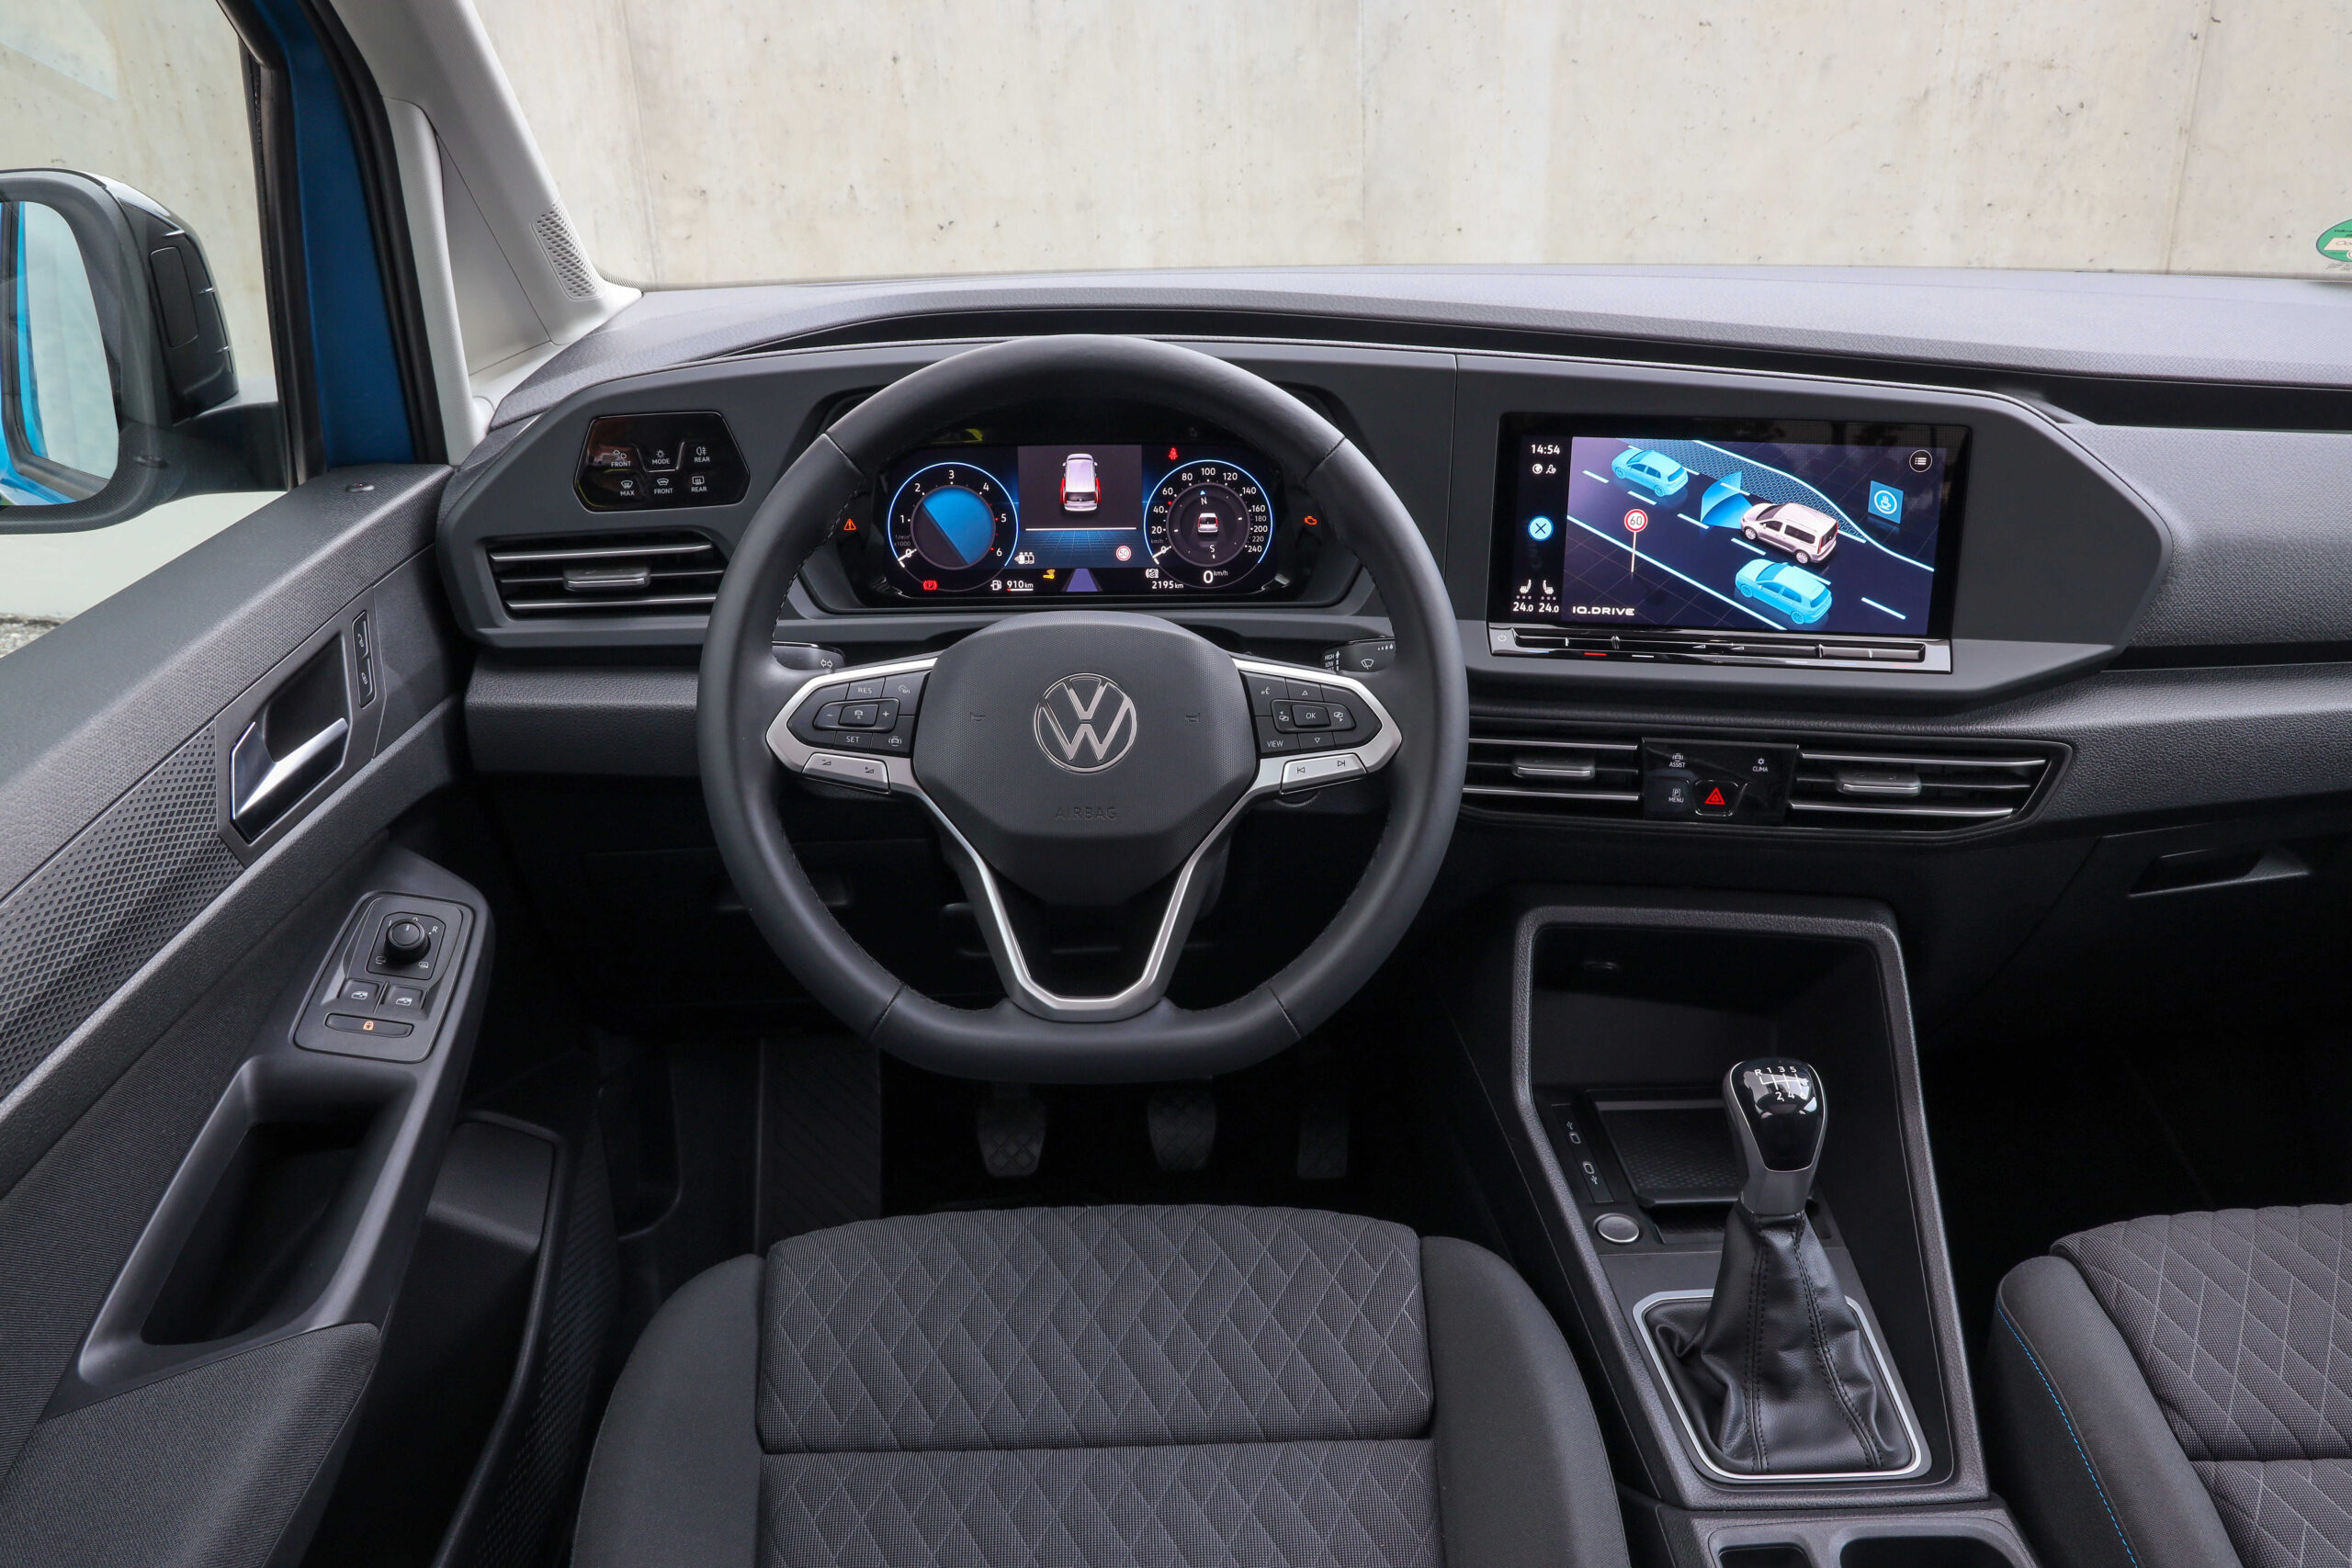 Volkswagen Caddy 5 Inovation cockpit